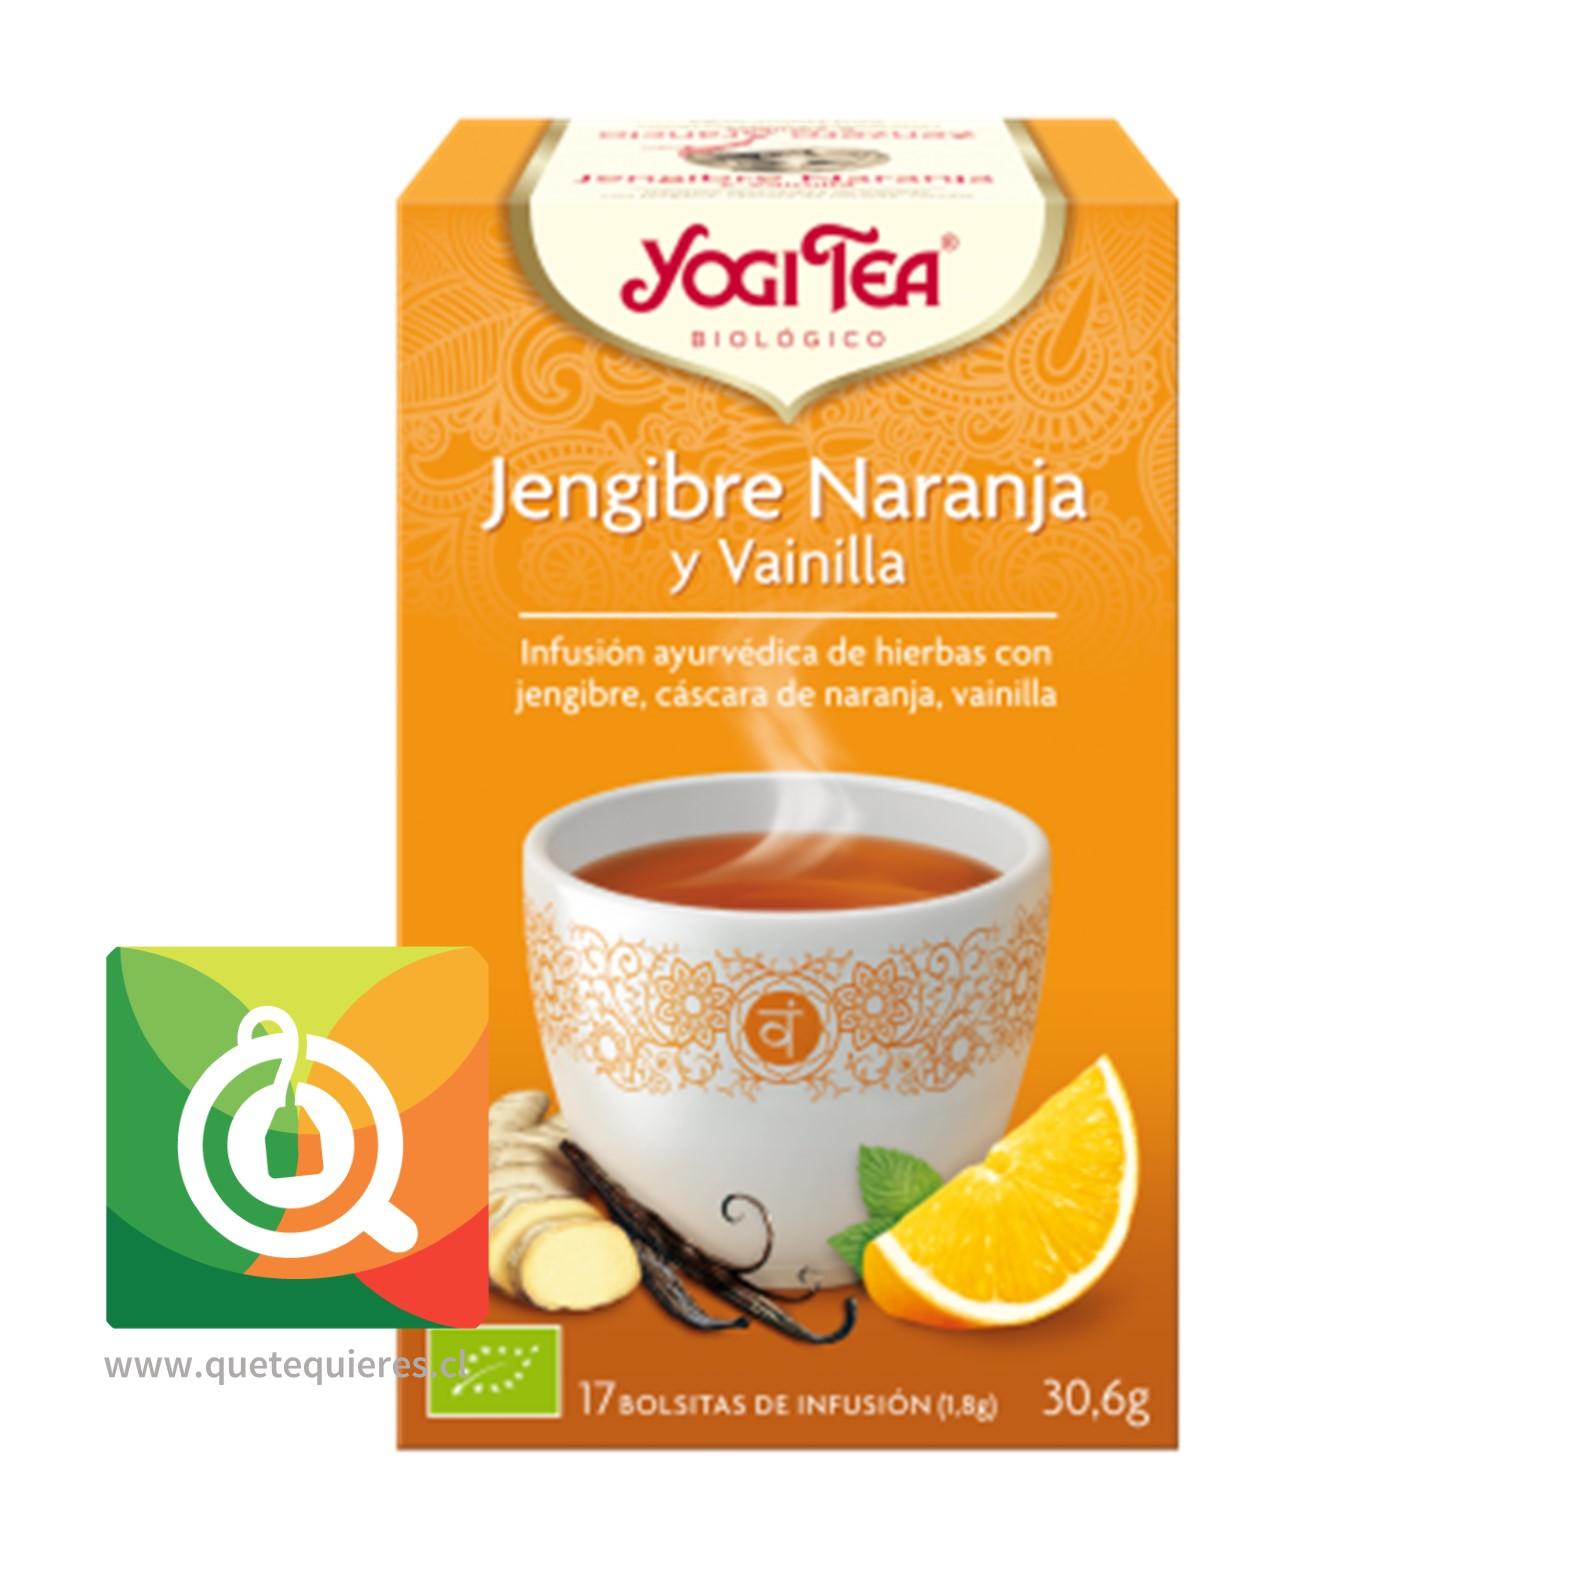 Yogi Tea Infusión Orgánica Jengibre, Naranja y Vainilla